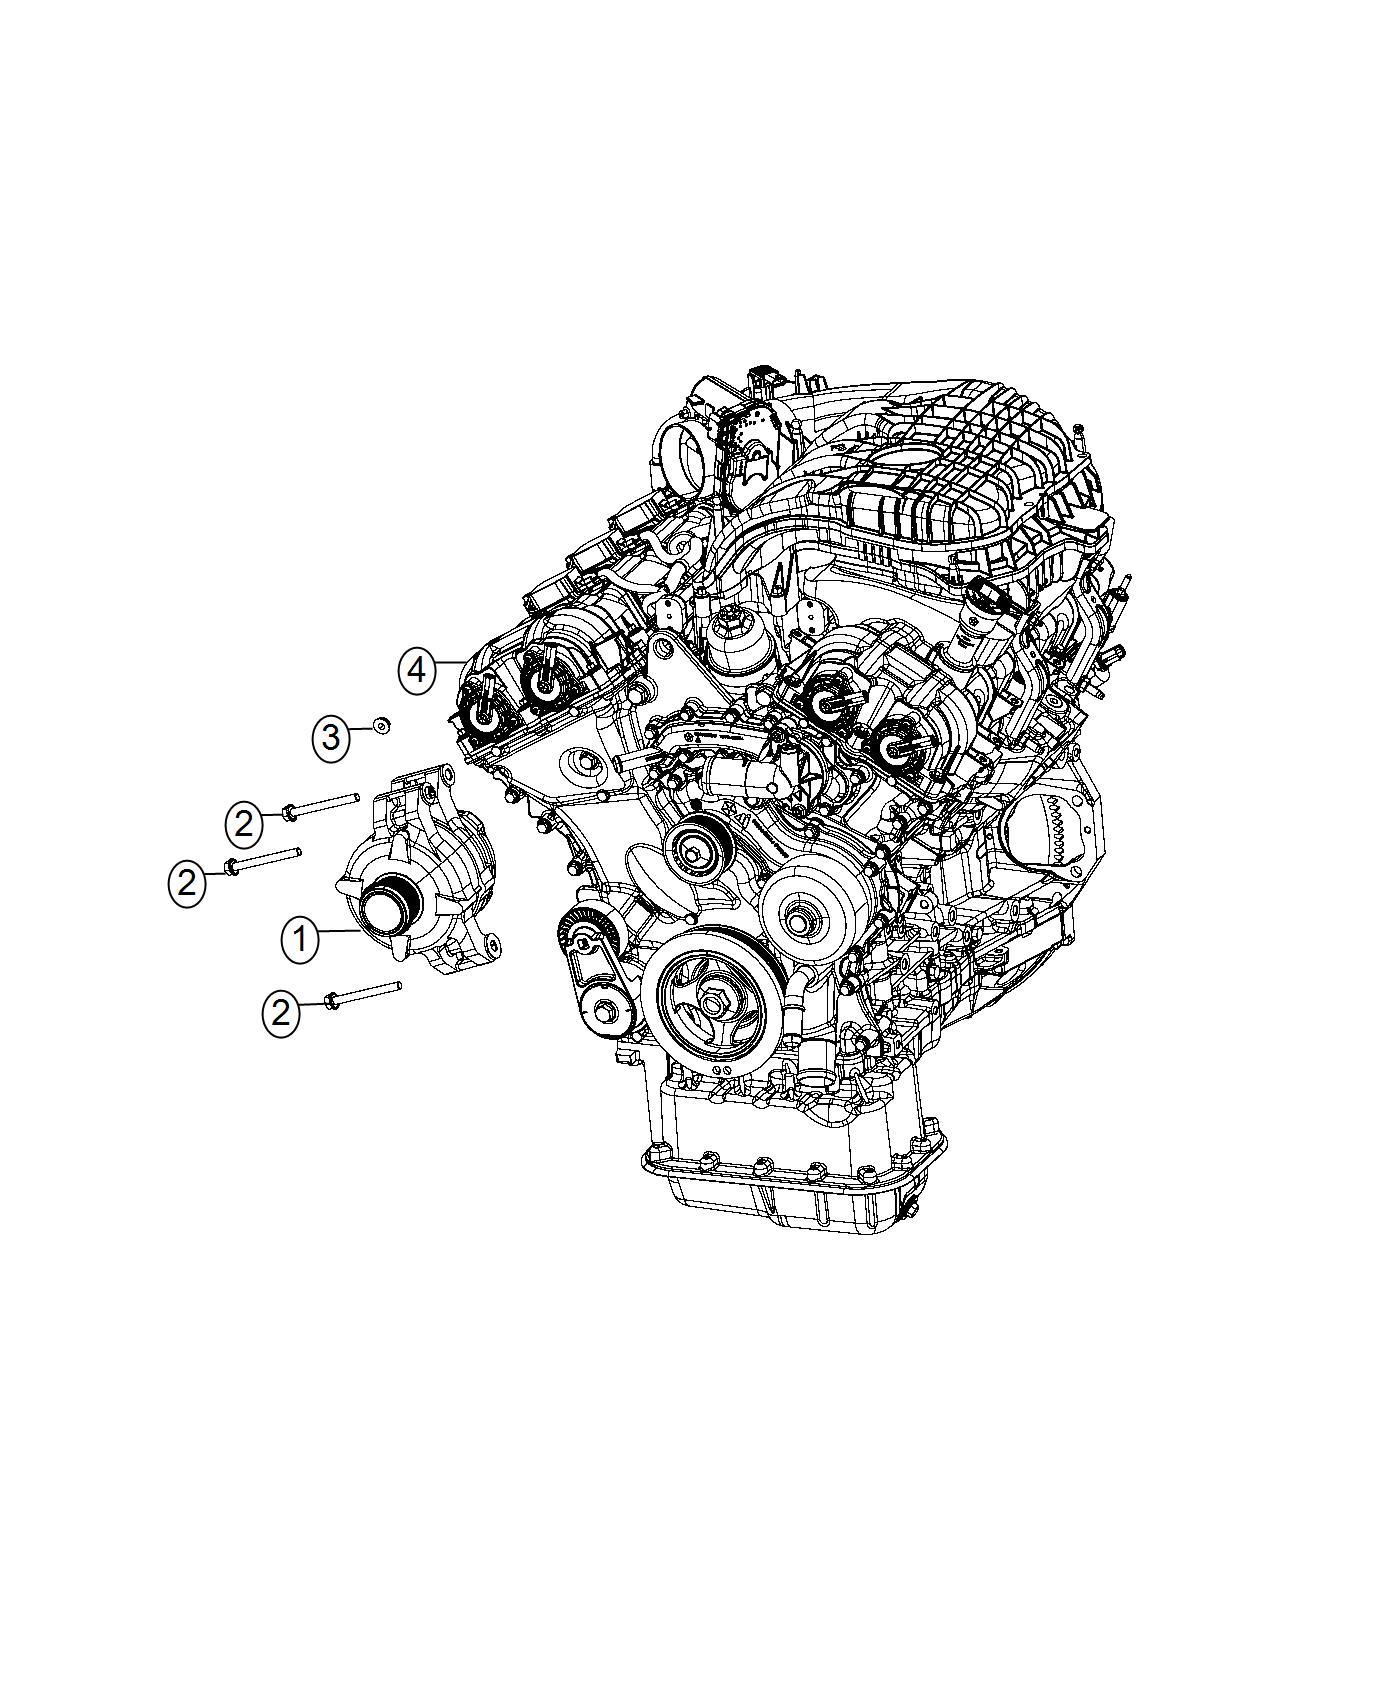 Chrysler 300 Generator. Engine. Remanufactured. Alternator